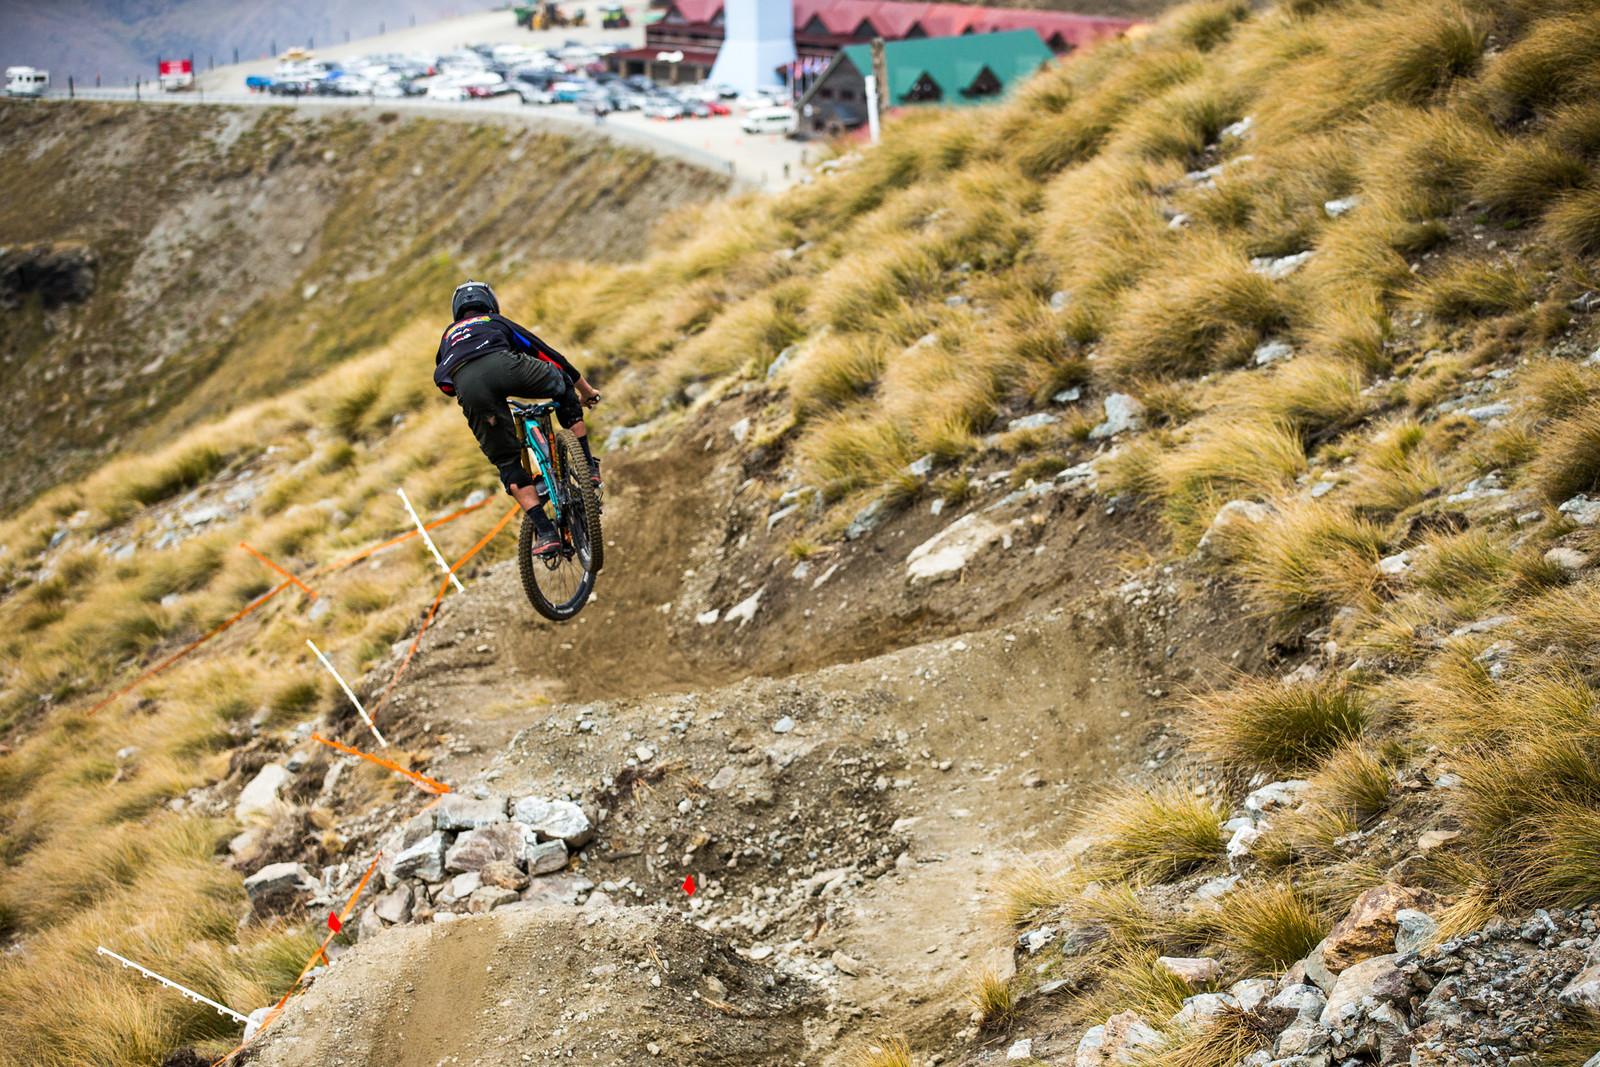 Gareth Burgess - Blenki, Brook & More - 2018 NZ National Champs Day 1 - Mountain Biking Pictures - Vital MTB